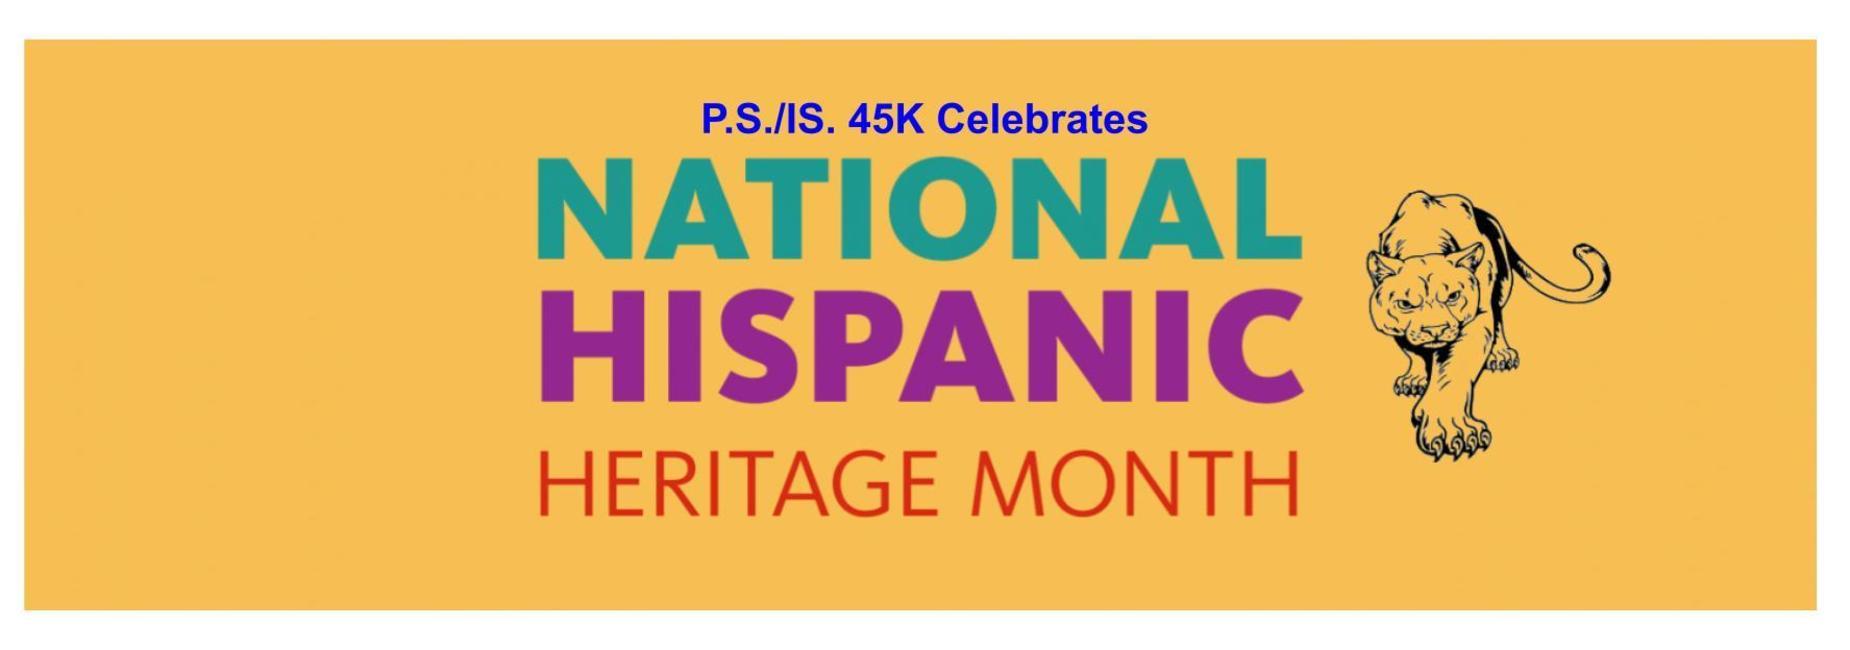 PS./IS. 45K Celebrates National Hispanic Heritage Month